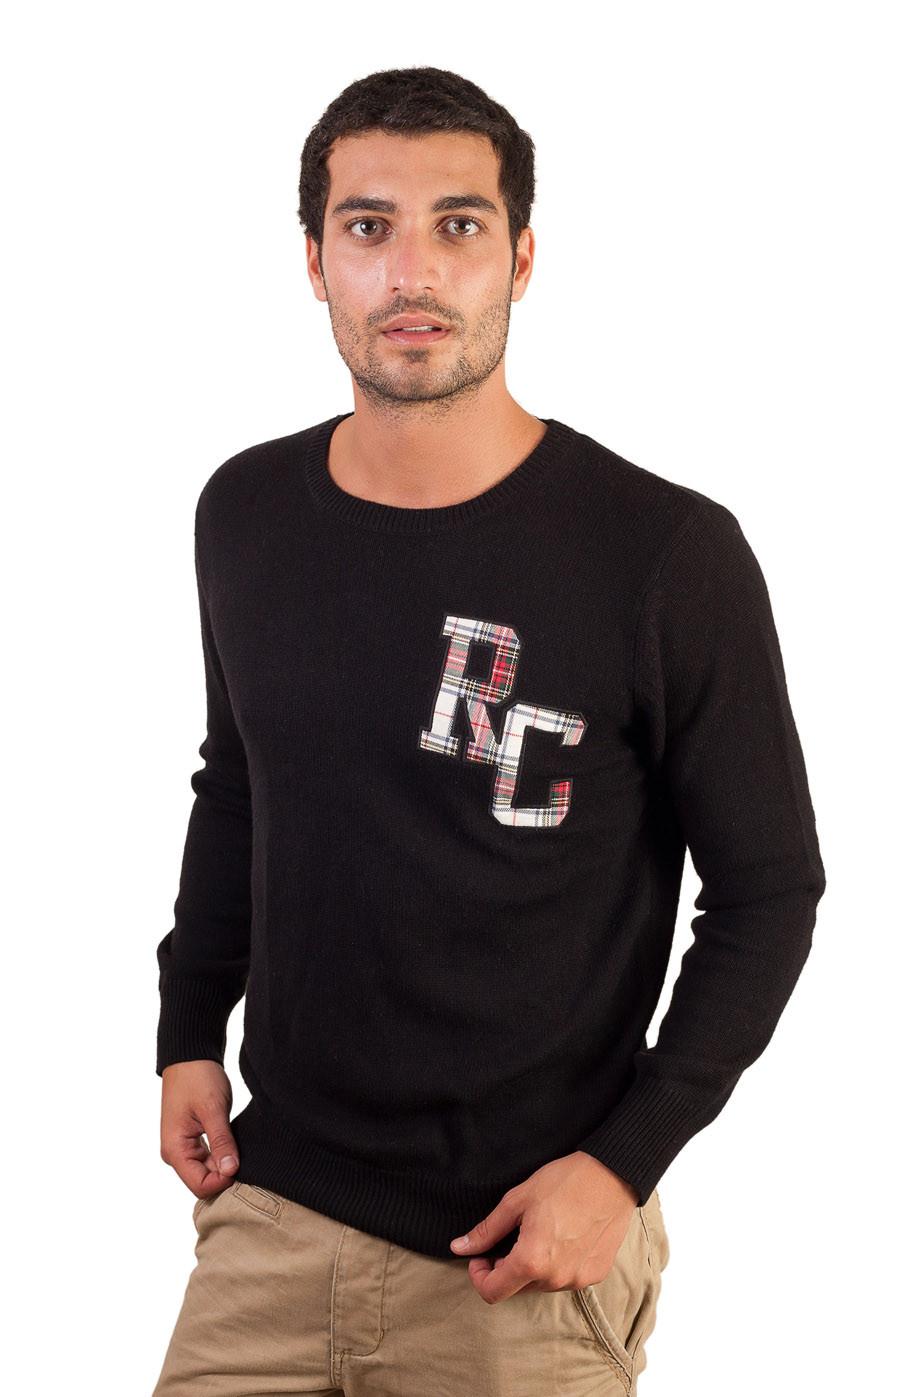 ROBERTSON-noir-XL